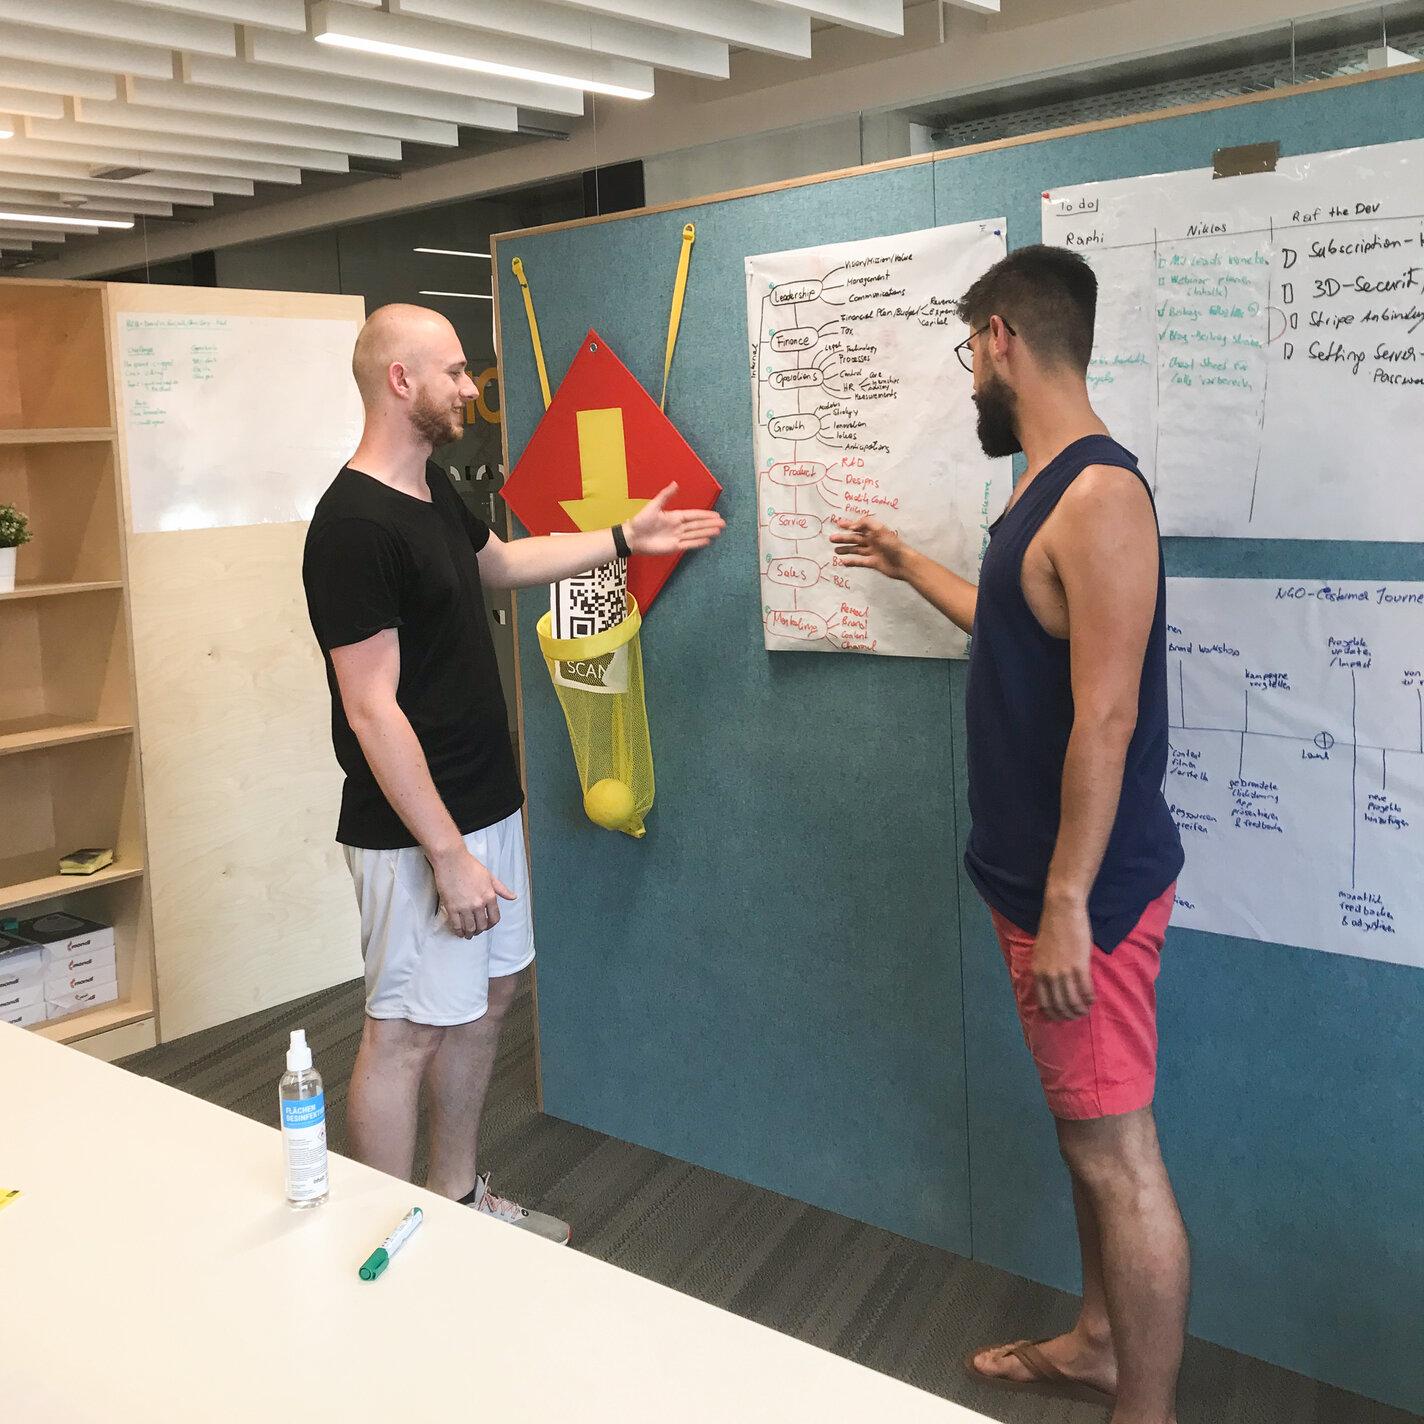 felloz-team-working-on-strategy